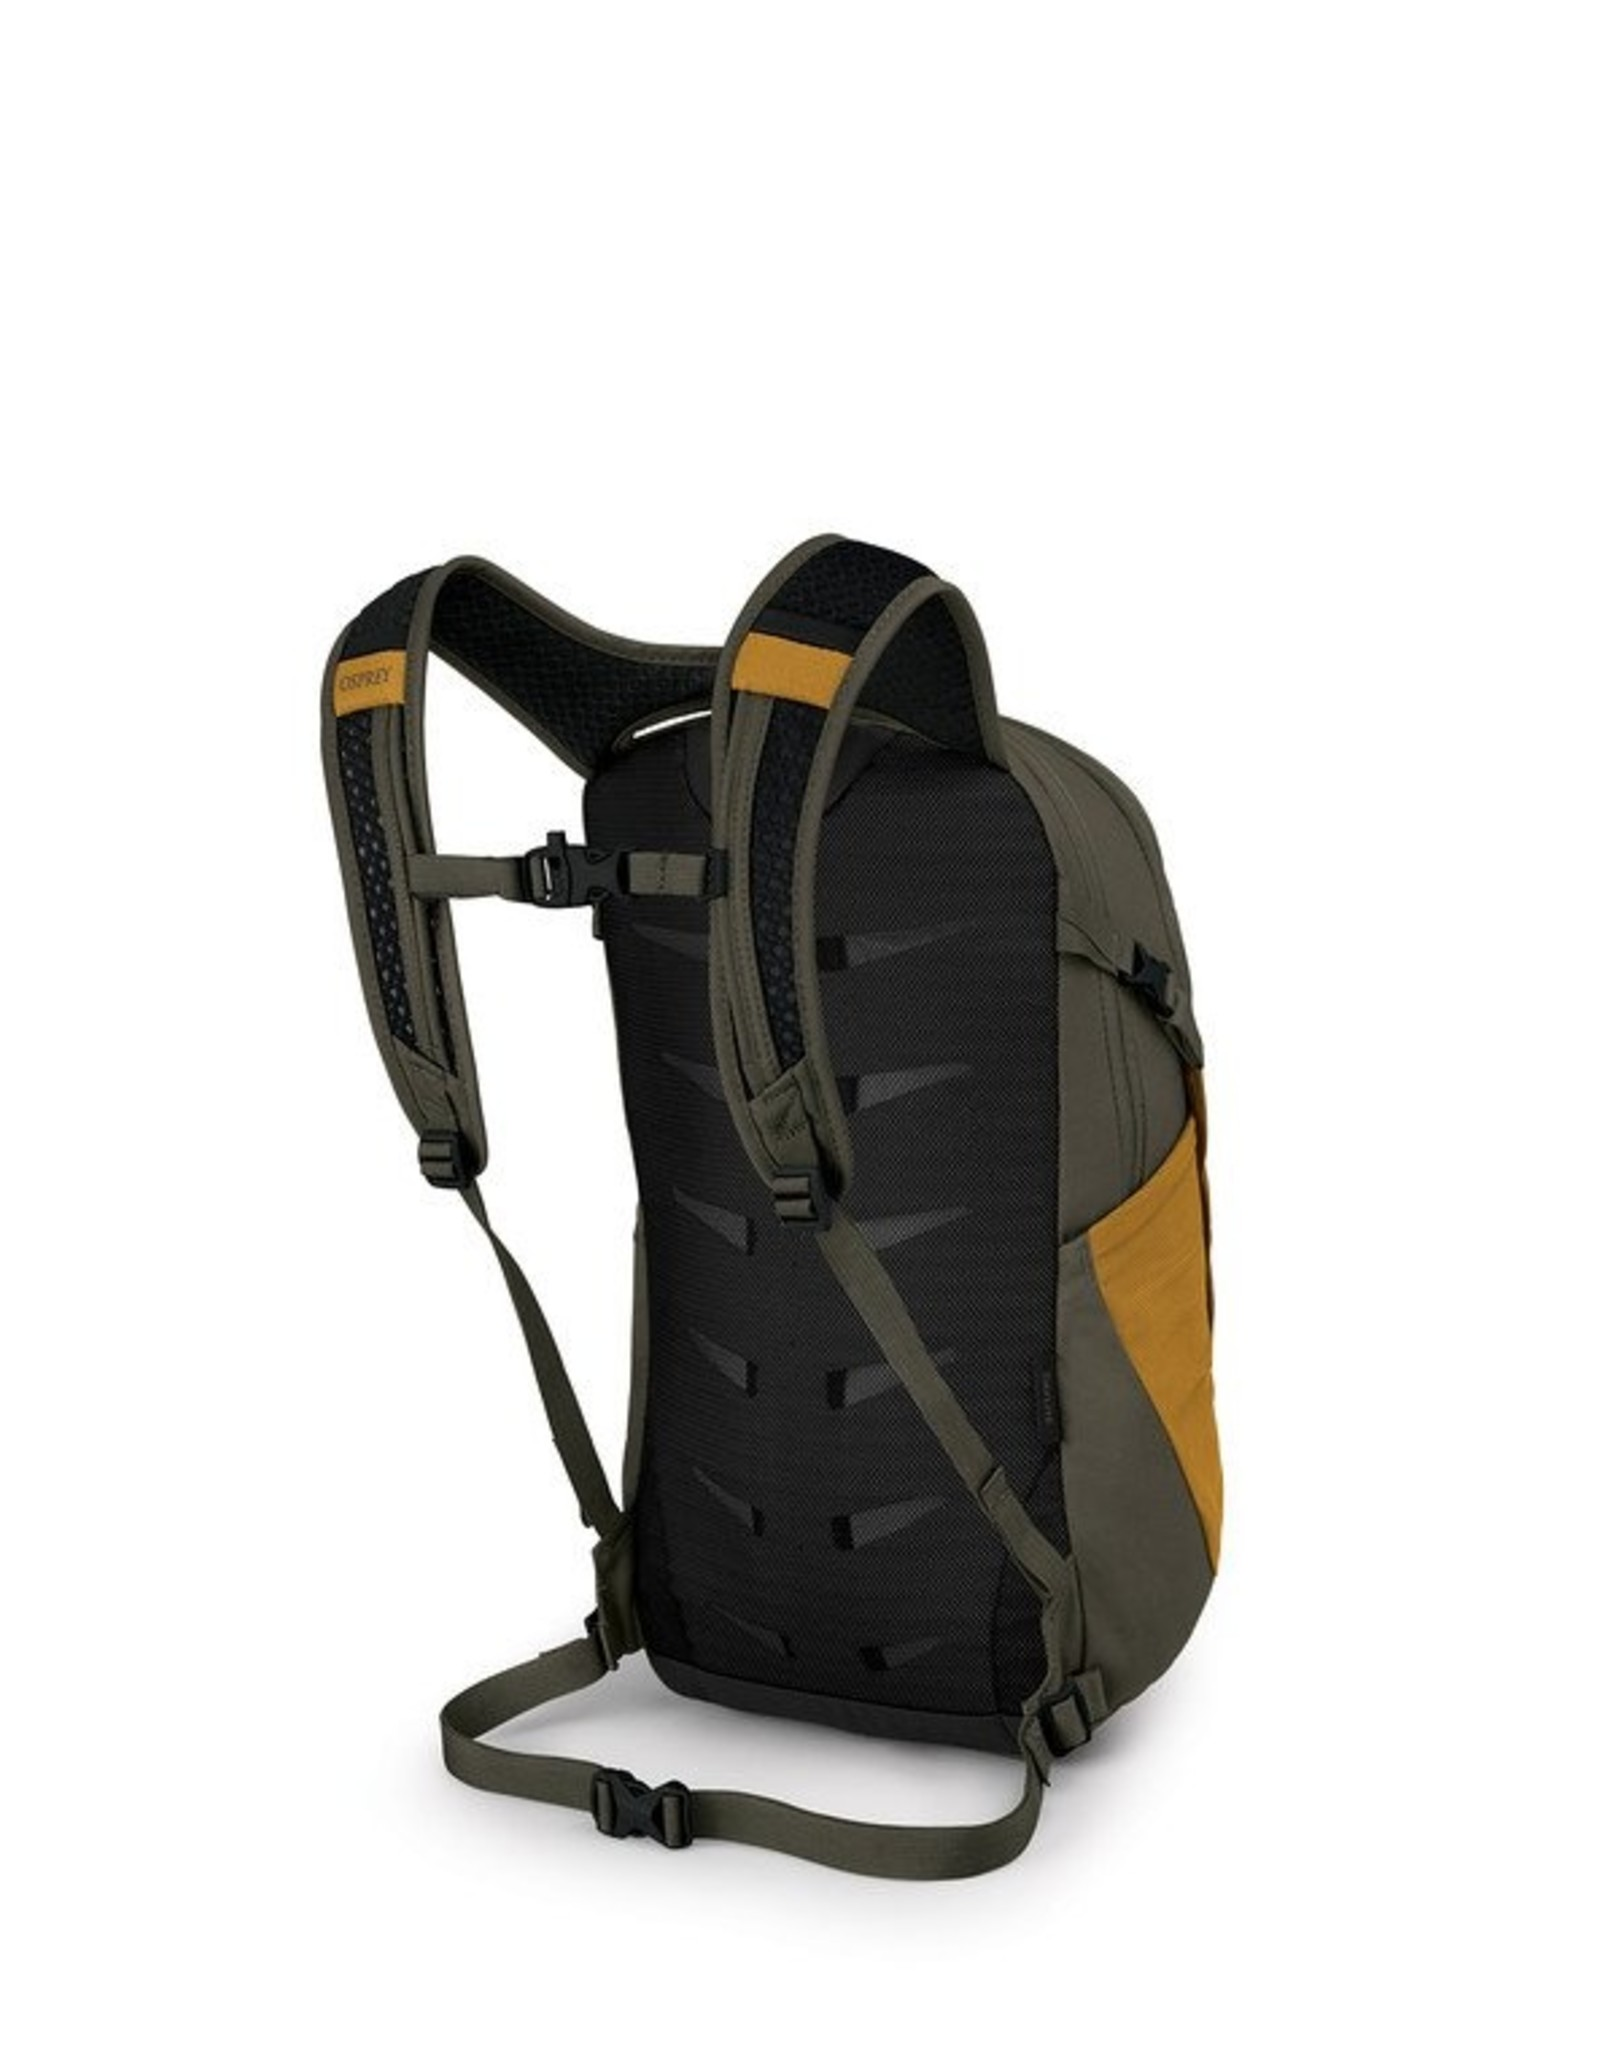 Osprey Osprey Daylite 13L Pack Teakwood Yellow